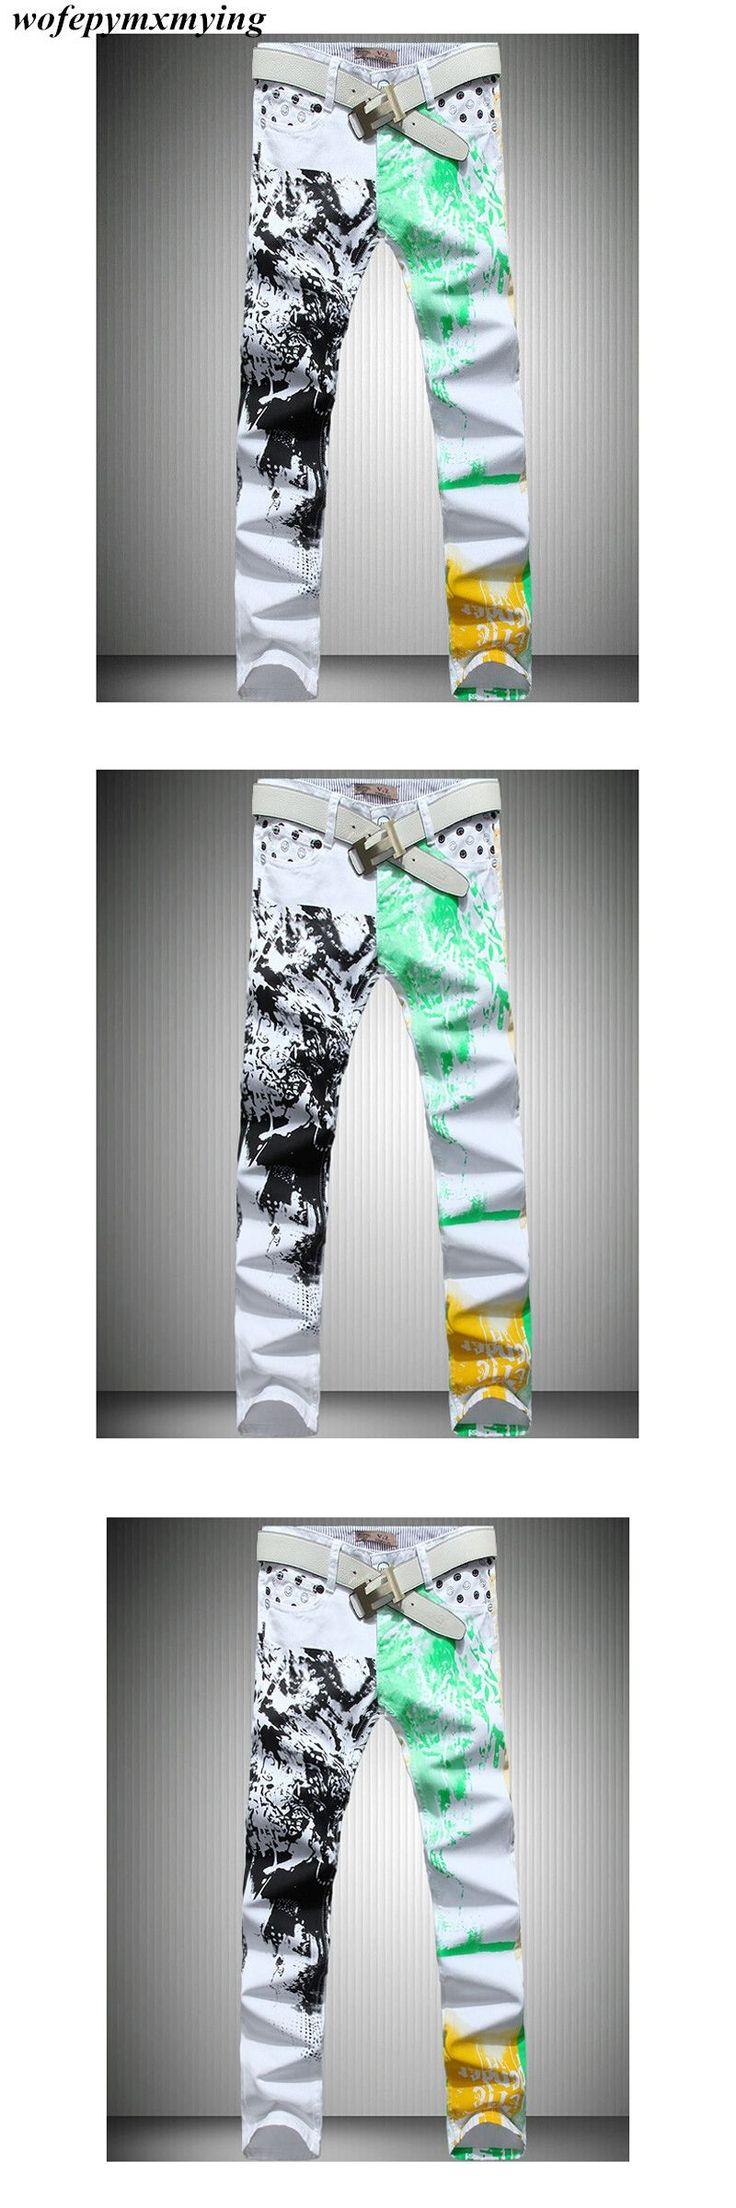 design funky jeans for men plus size 44 46 vintage printing custom skinny fit denim jeans pants cheap clothes mens printed jeans